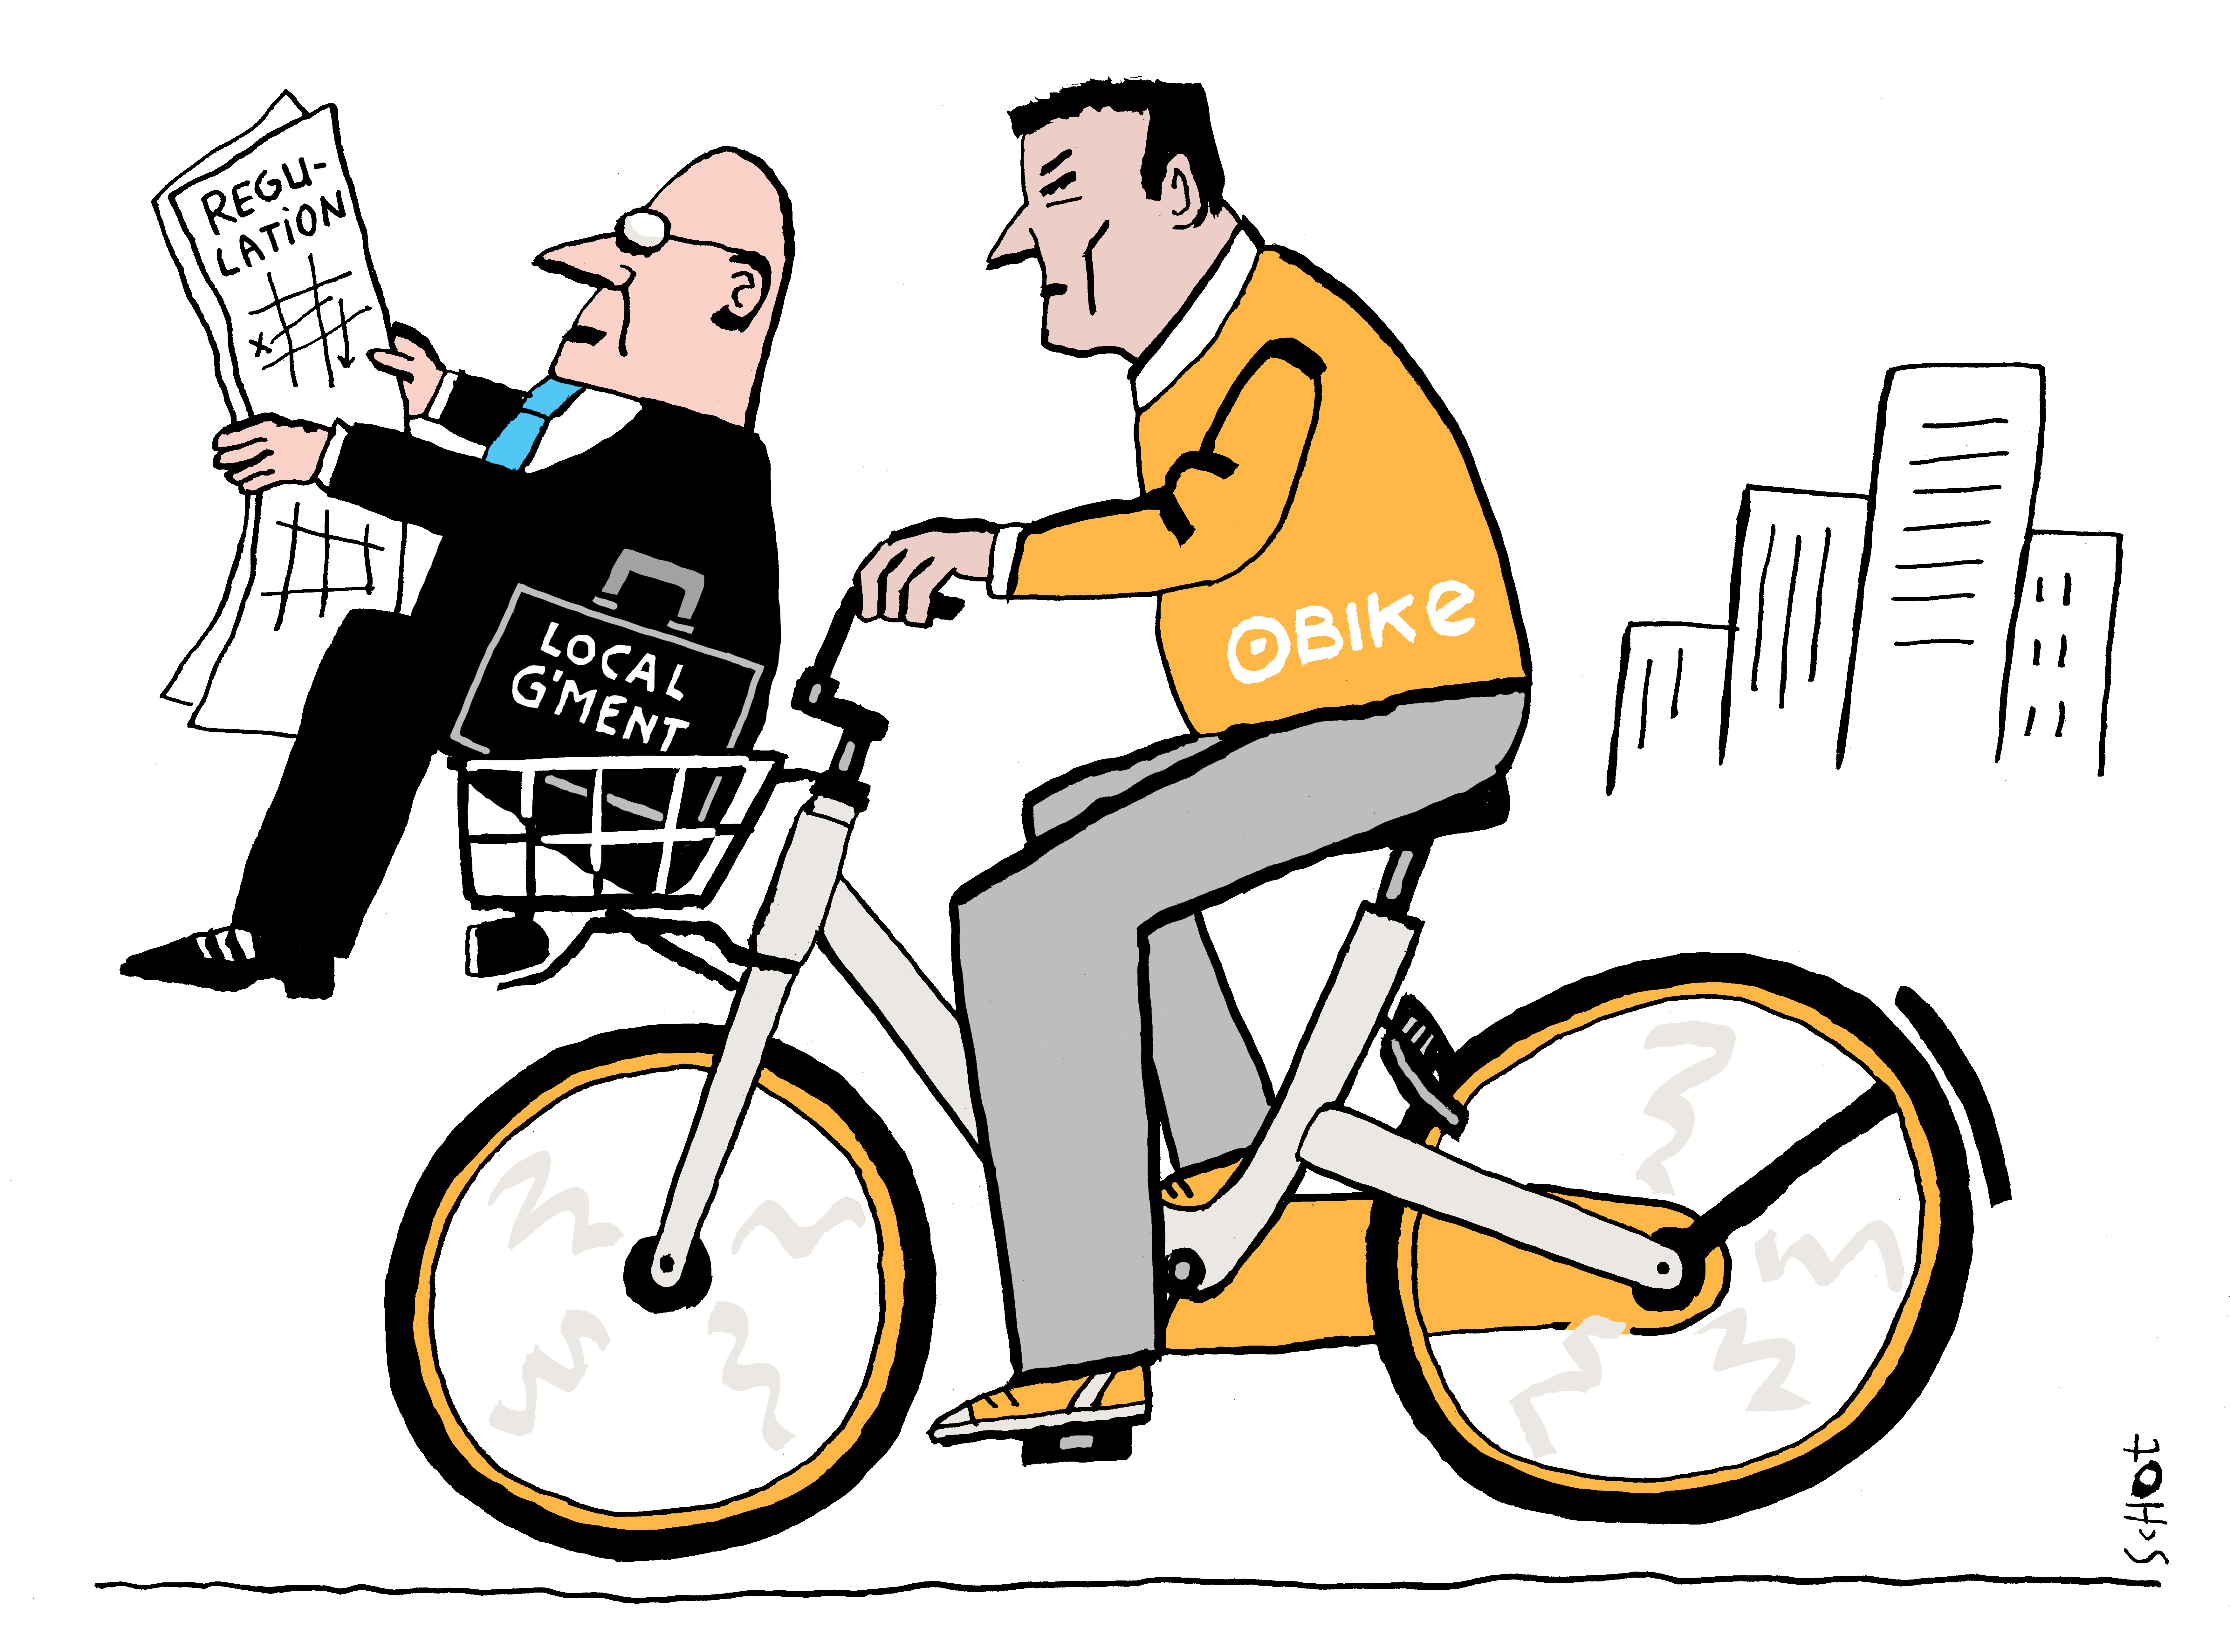 em-engels fiets obike gemeente